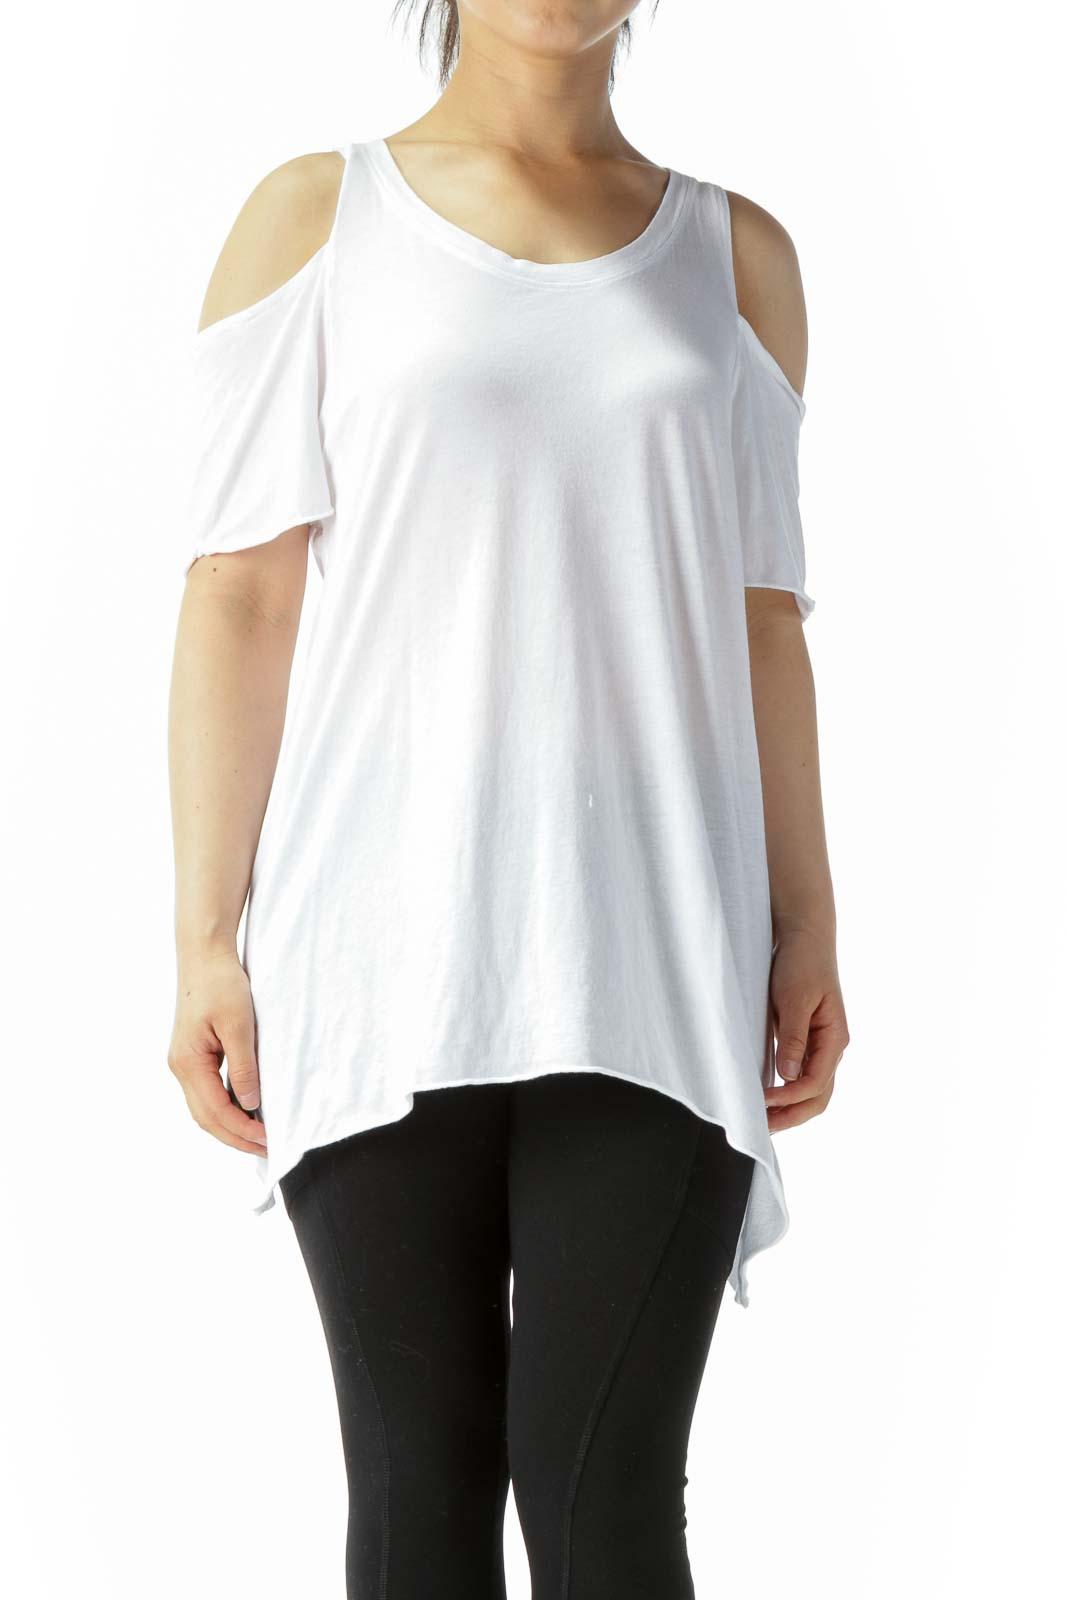 White Supima Cotton Blend Cold Shoulder Short-Sleeve Soft Top